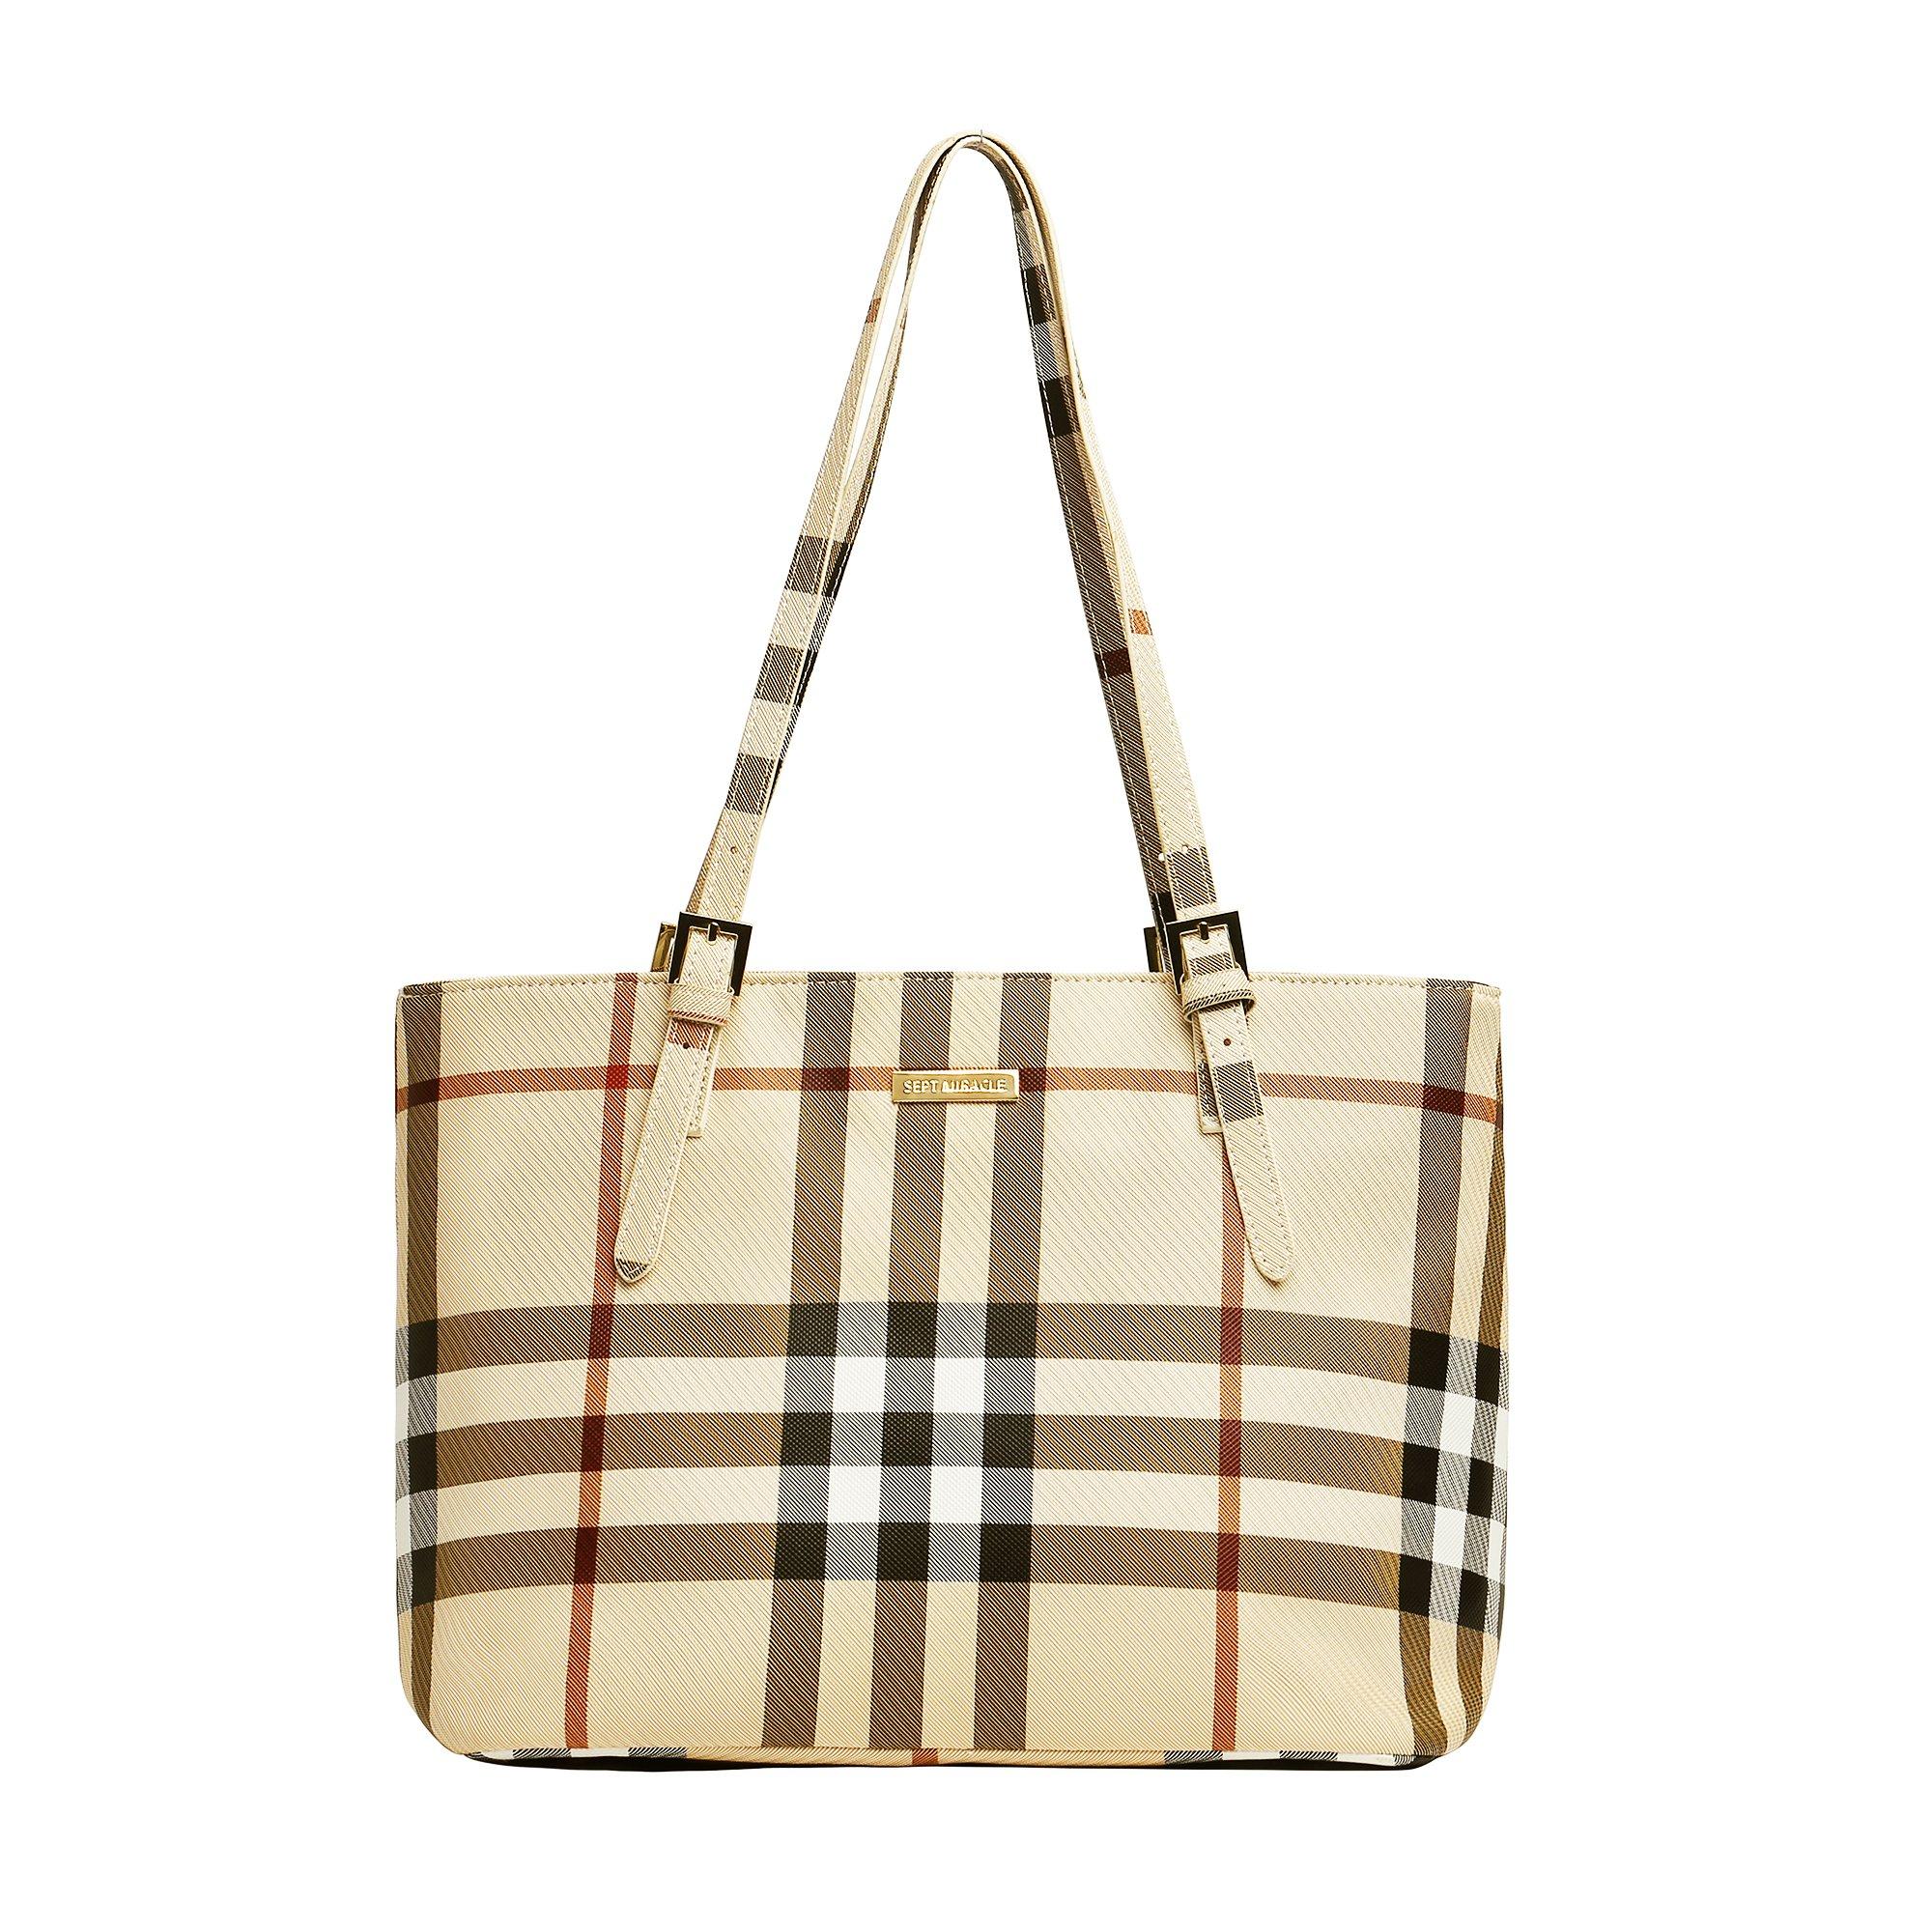 SEPT MIRACLE PU Leather Womens Portable Handbags Tote Bag Shoulder Bag Purse with Zipper(Khaki)